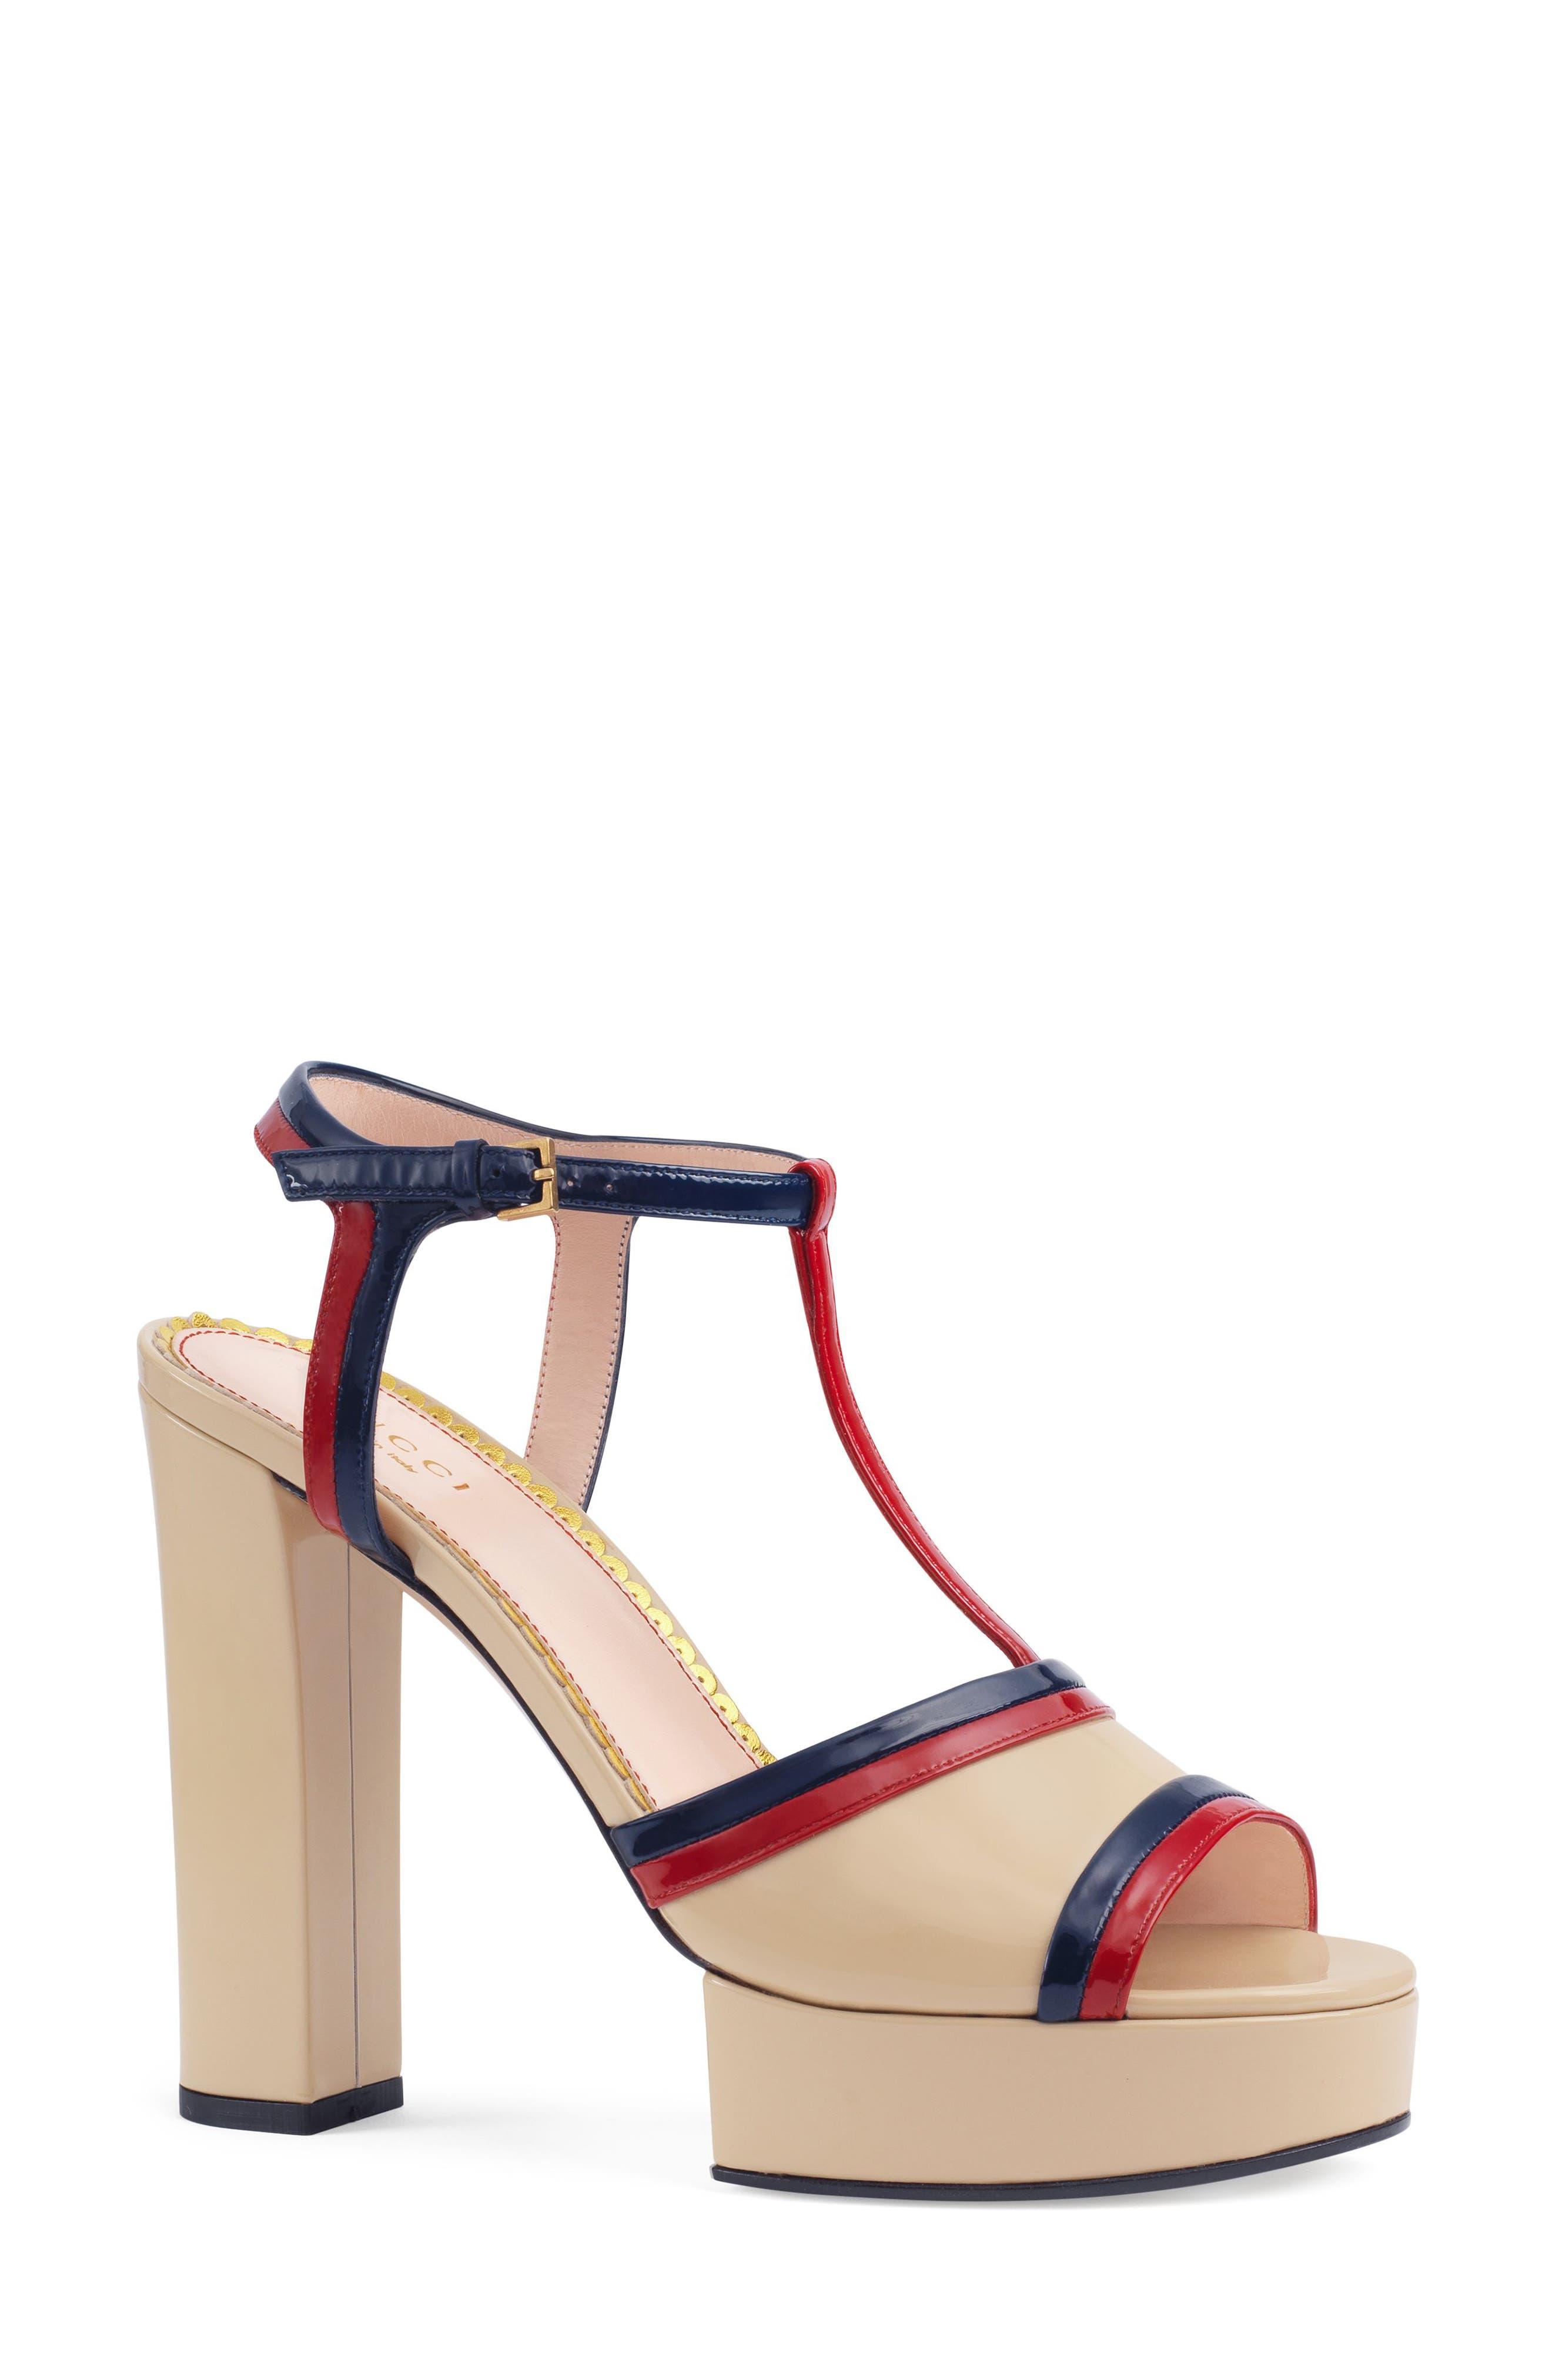 Main Image - Gucci Millie T-Strap Platform Sandal (Women)